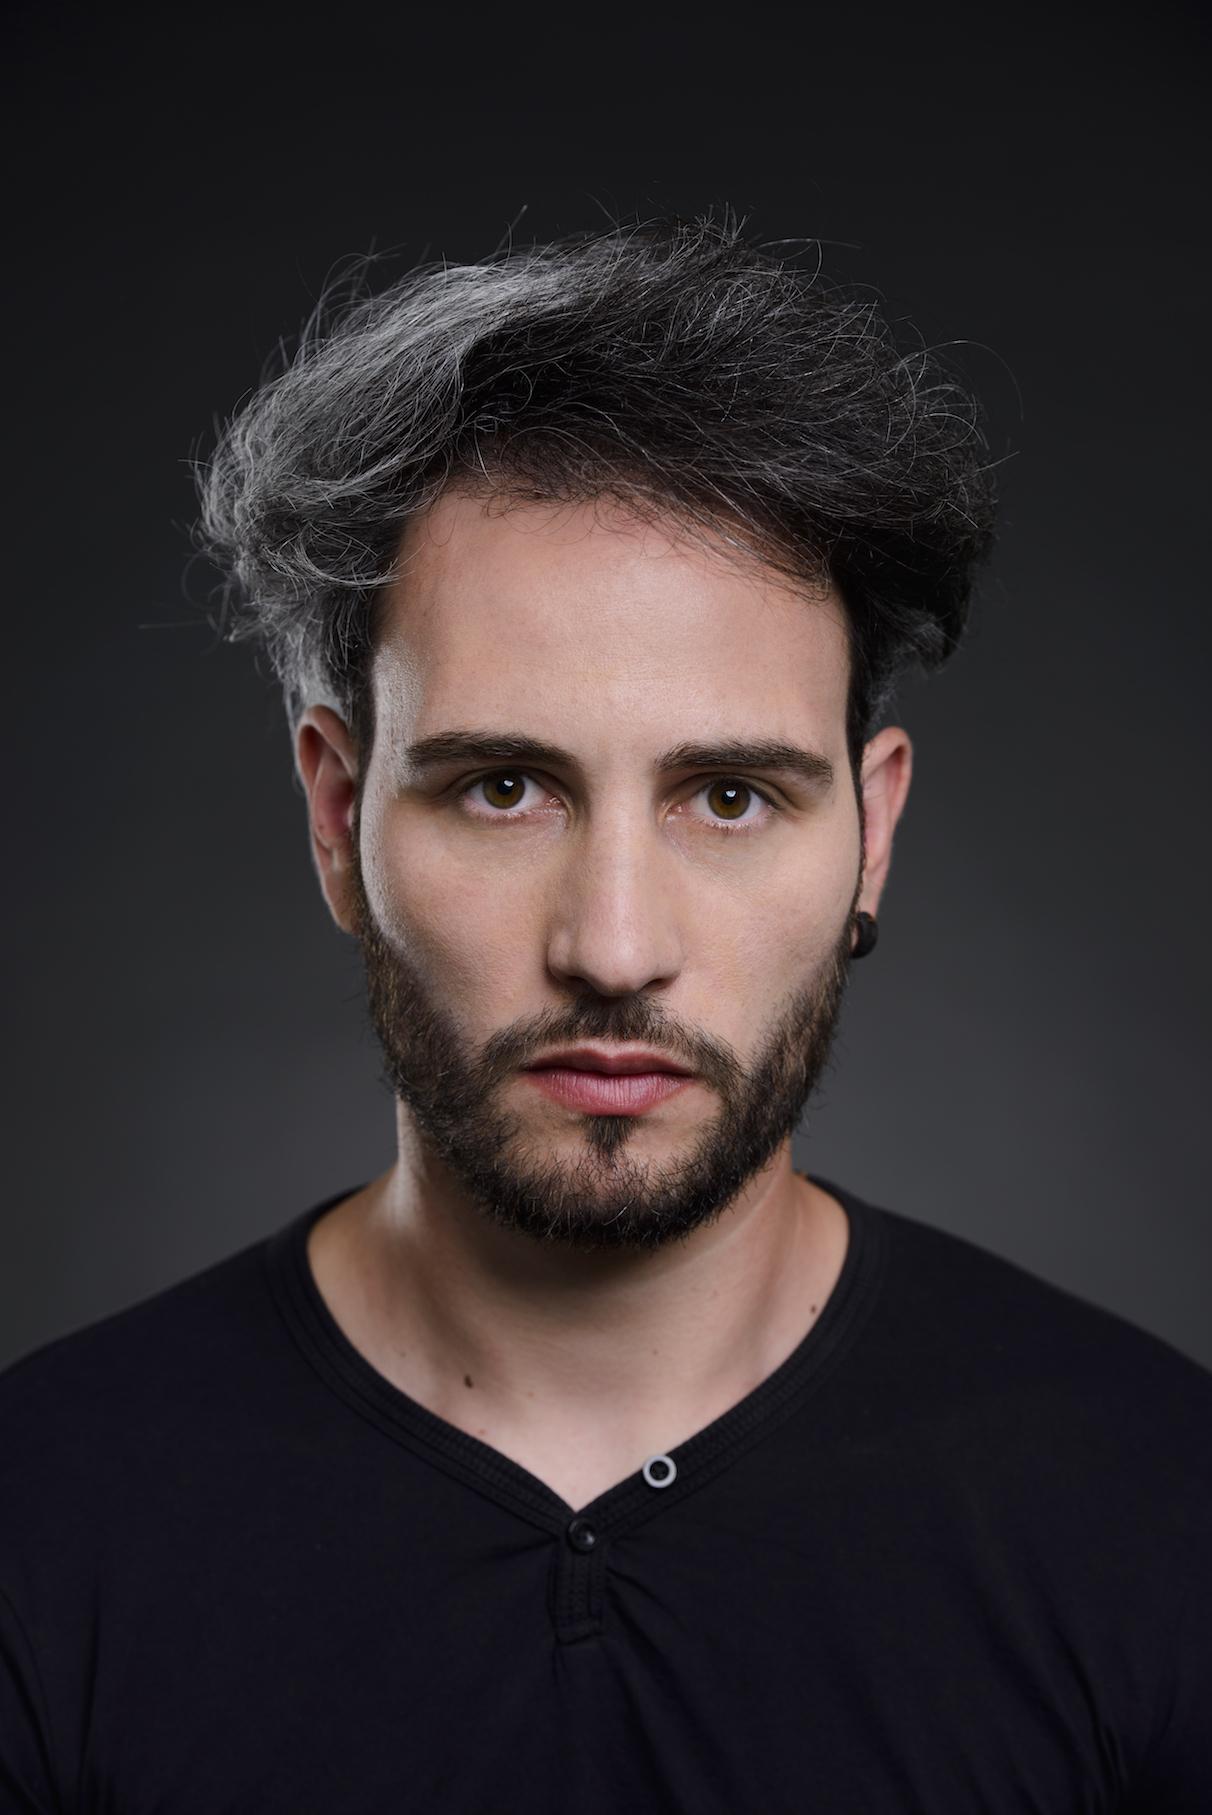 Alberto Medeiros